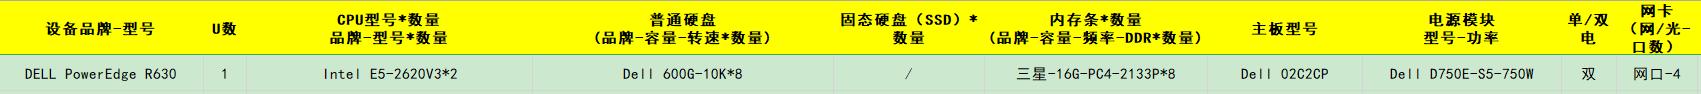 DELL PowerEdge R630 Intel E5-2620V3*2 Dell 600G-10K*8 三星-16G-PC4-2133P*8